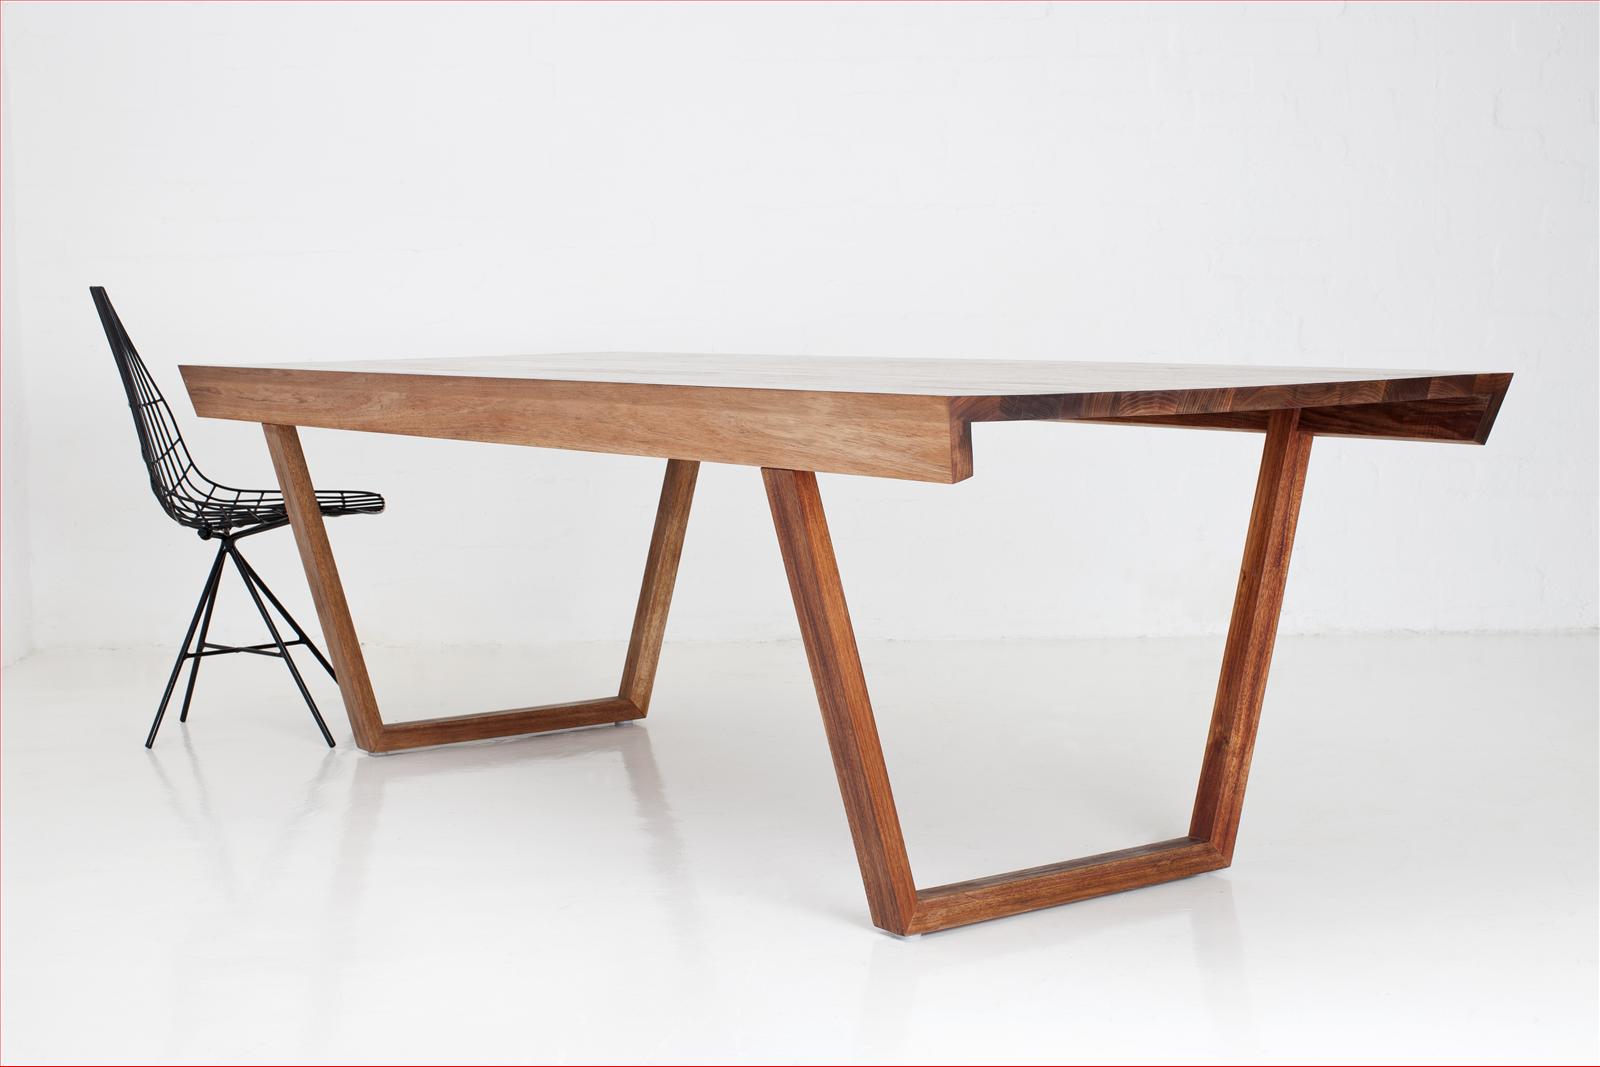 Bamboo Plywood Furniture Legs Google Search Mebel Dizajn Stol